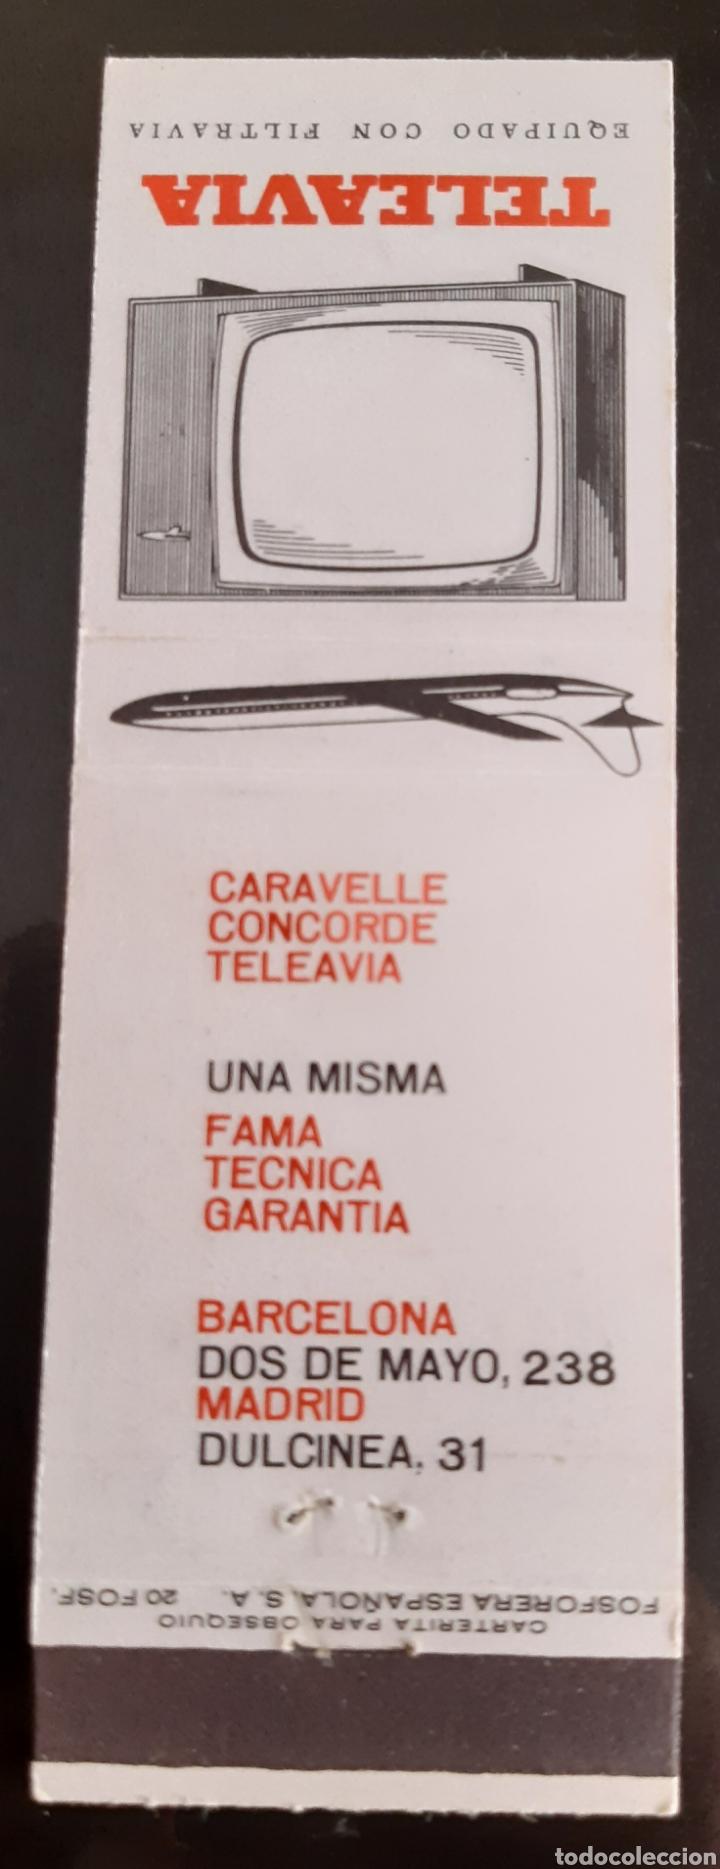 Cajas de Cerillas: CARTERITA CERILLAS - TELEAVIA - FILTRAVIA - CARAVELLE CONCORDE TELEAVIA - Foto 2 - 205304816